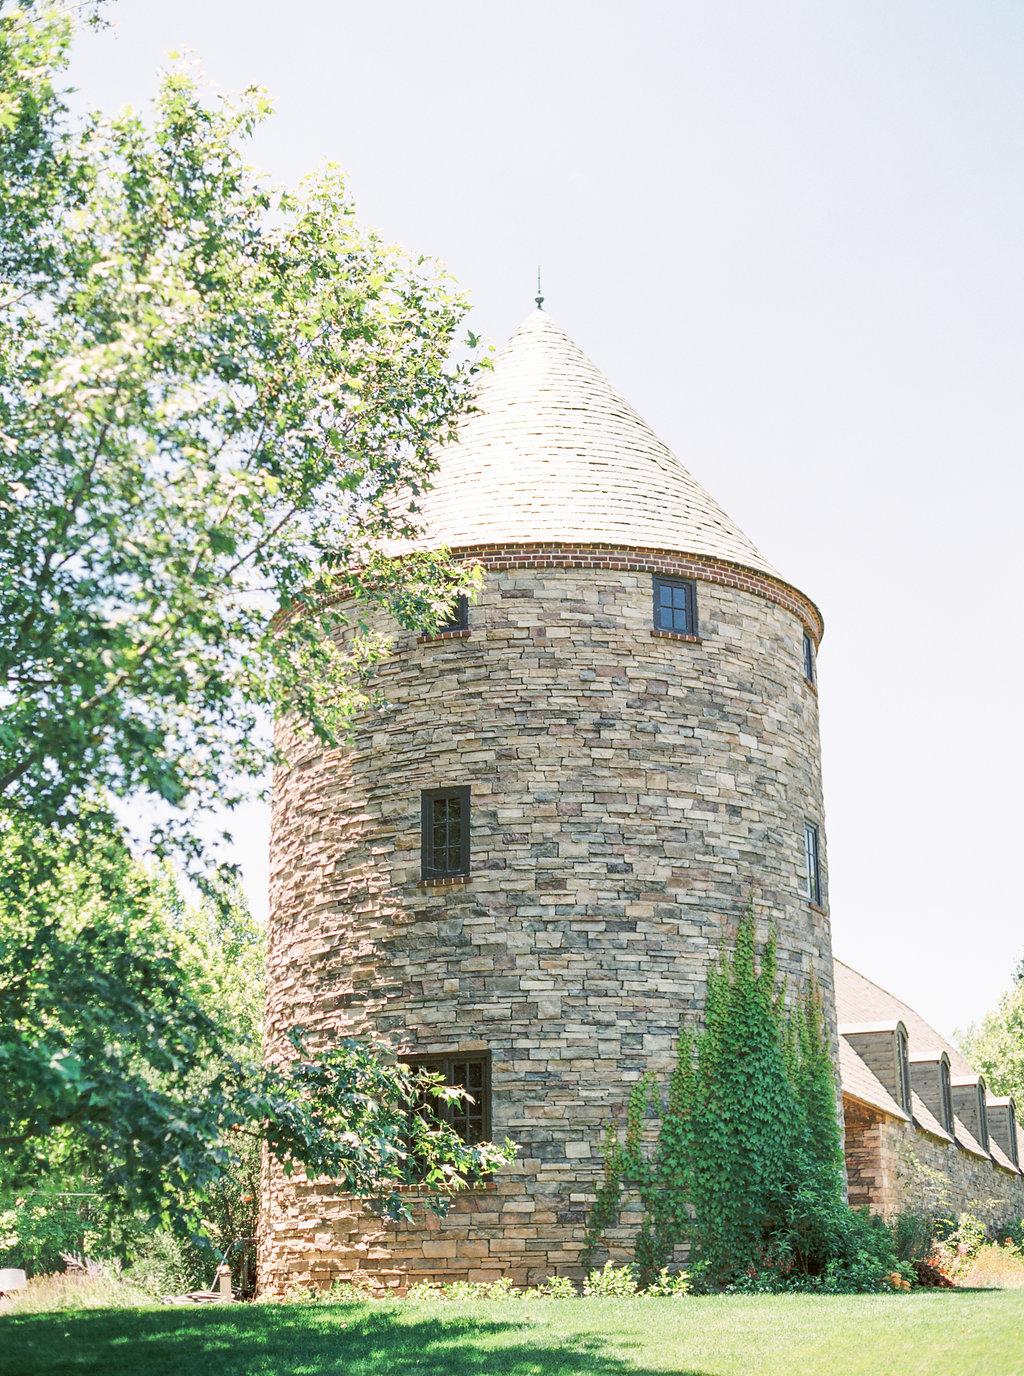 alegria-by-design-wedding-planner-planning-event-design-santa-barbara-day-of-coordinator-kestrel-park-santa-ynez-fields-castle-lavender-garden-mrs-box (8).jpg